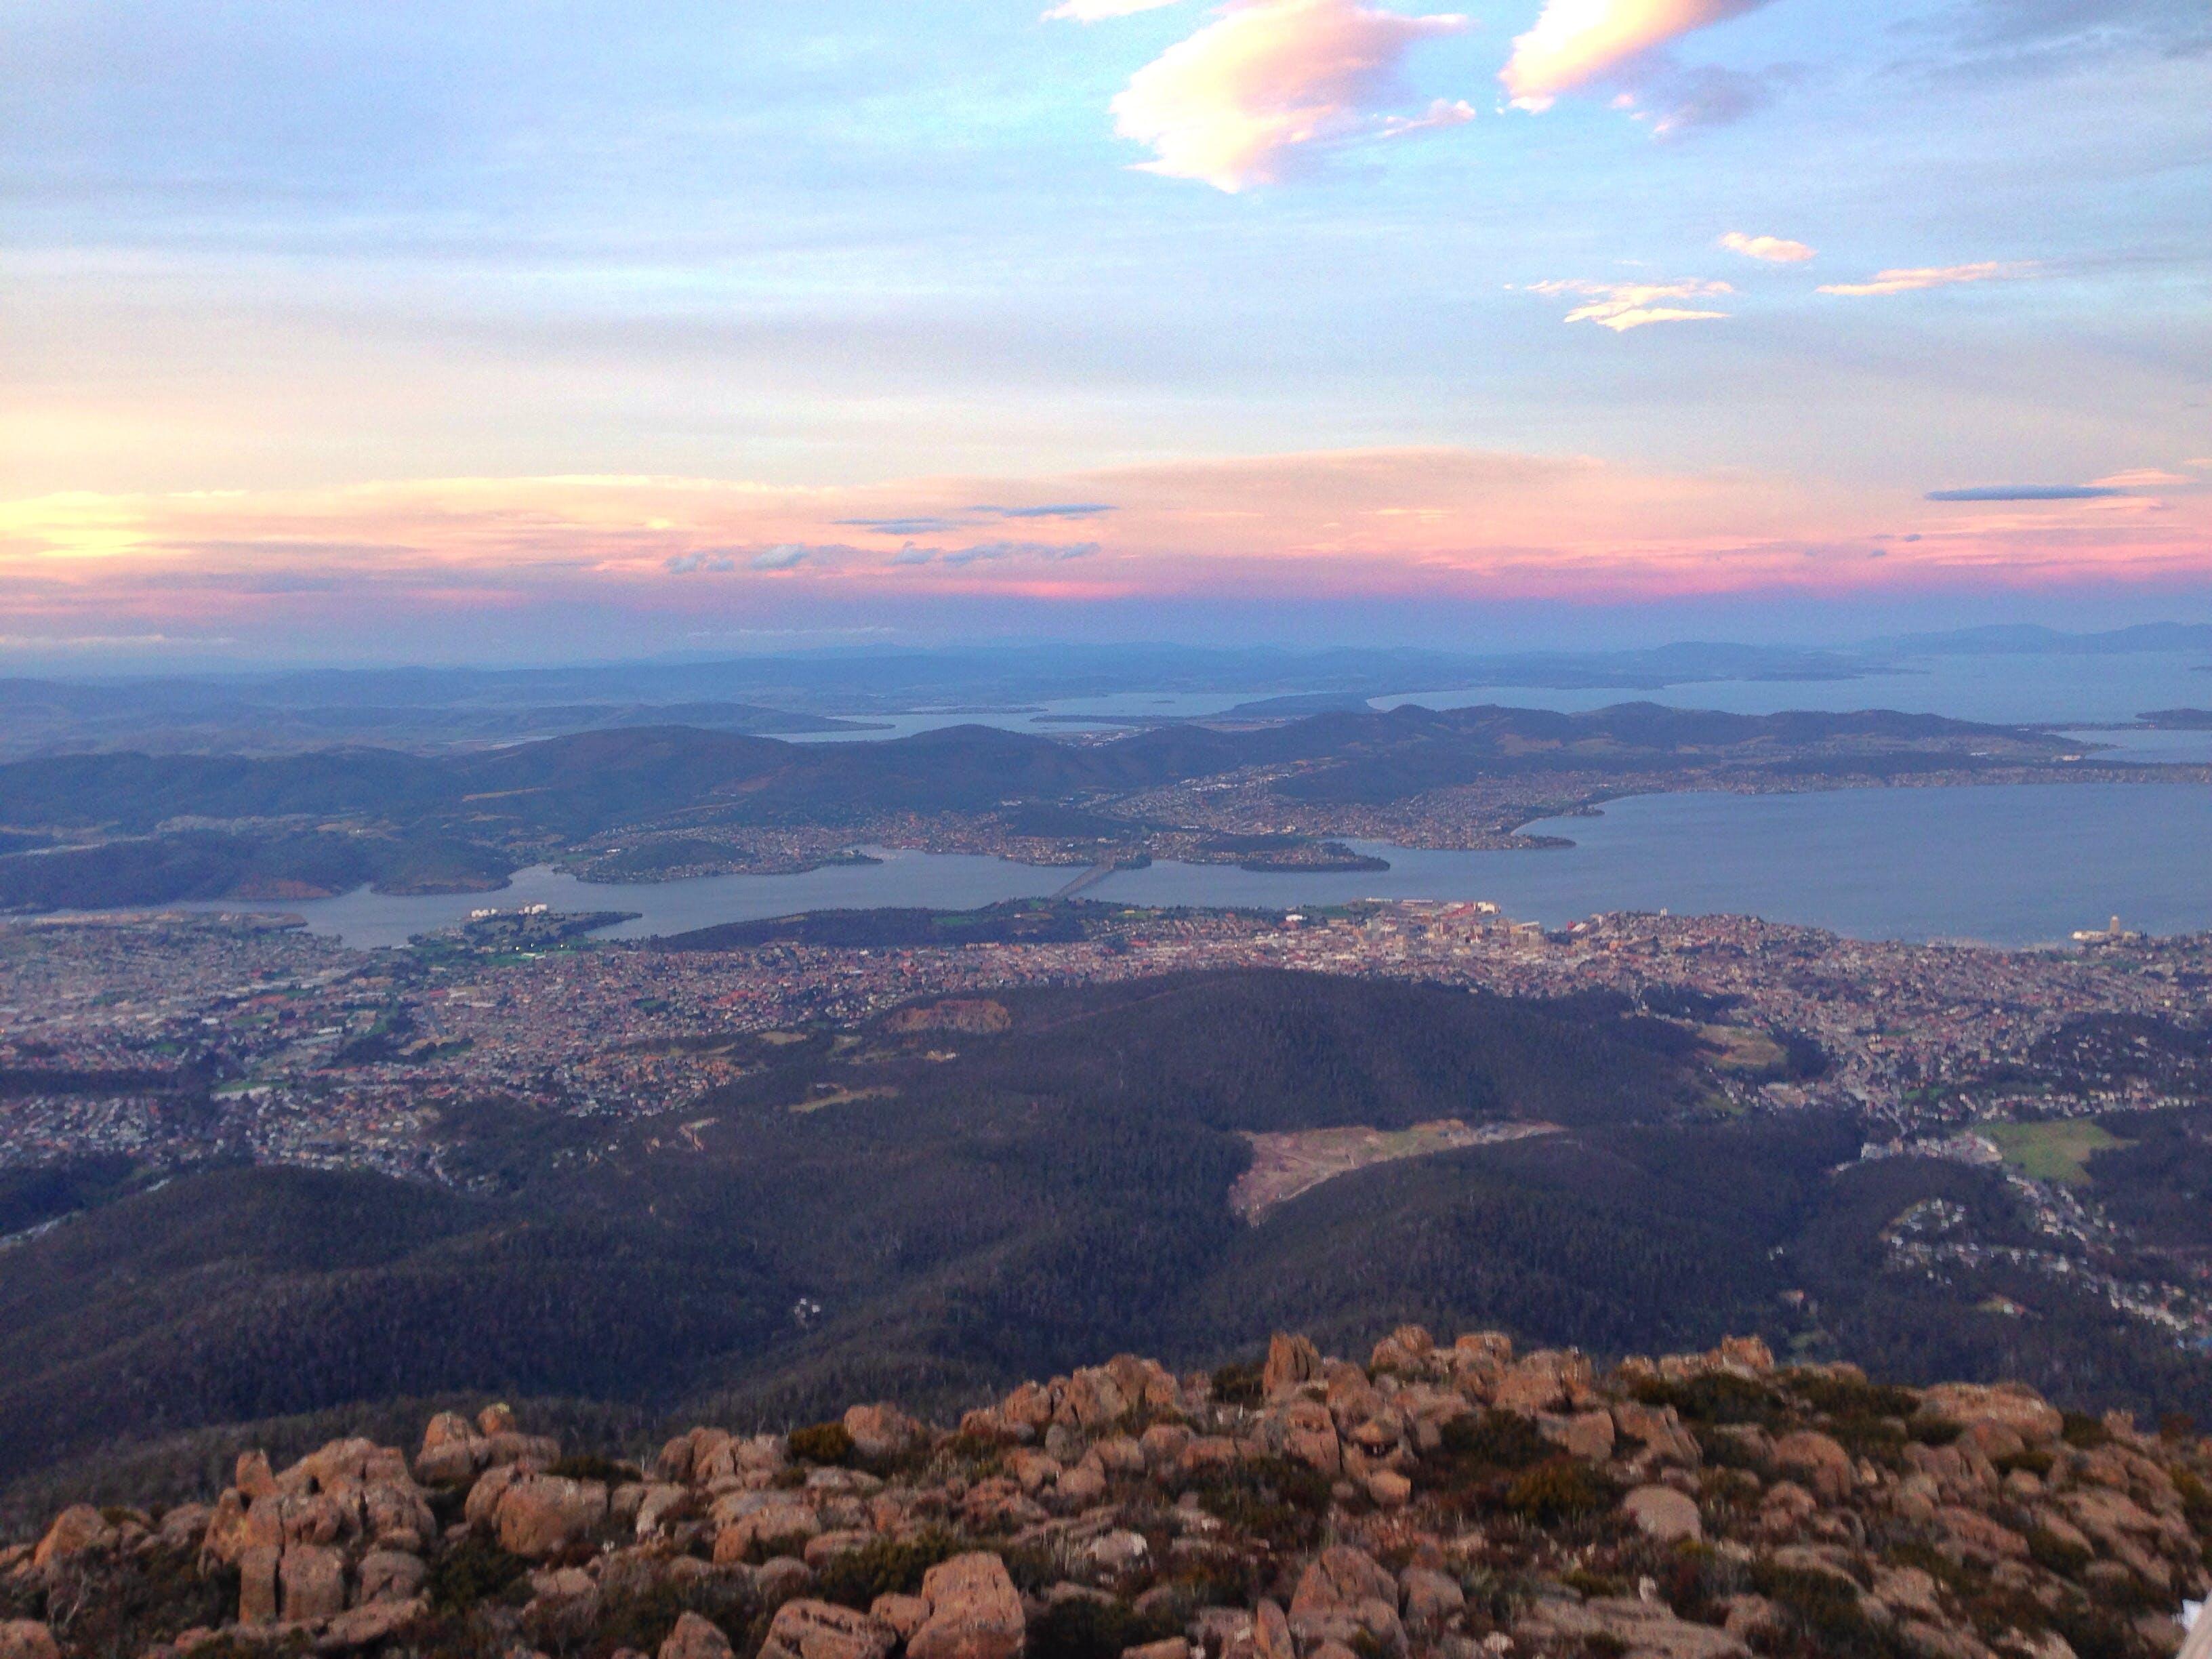 Free stock photo of sunset, tasmania, Mt Wellington